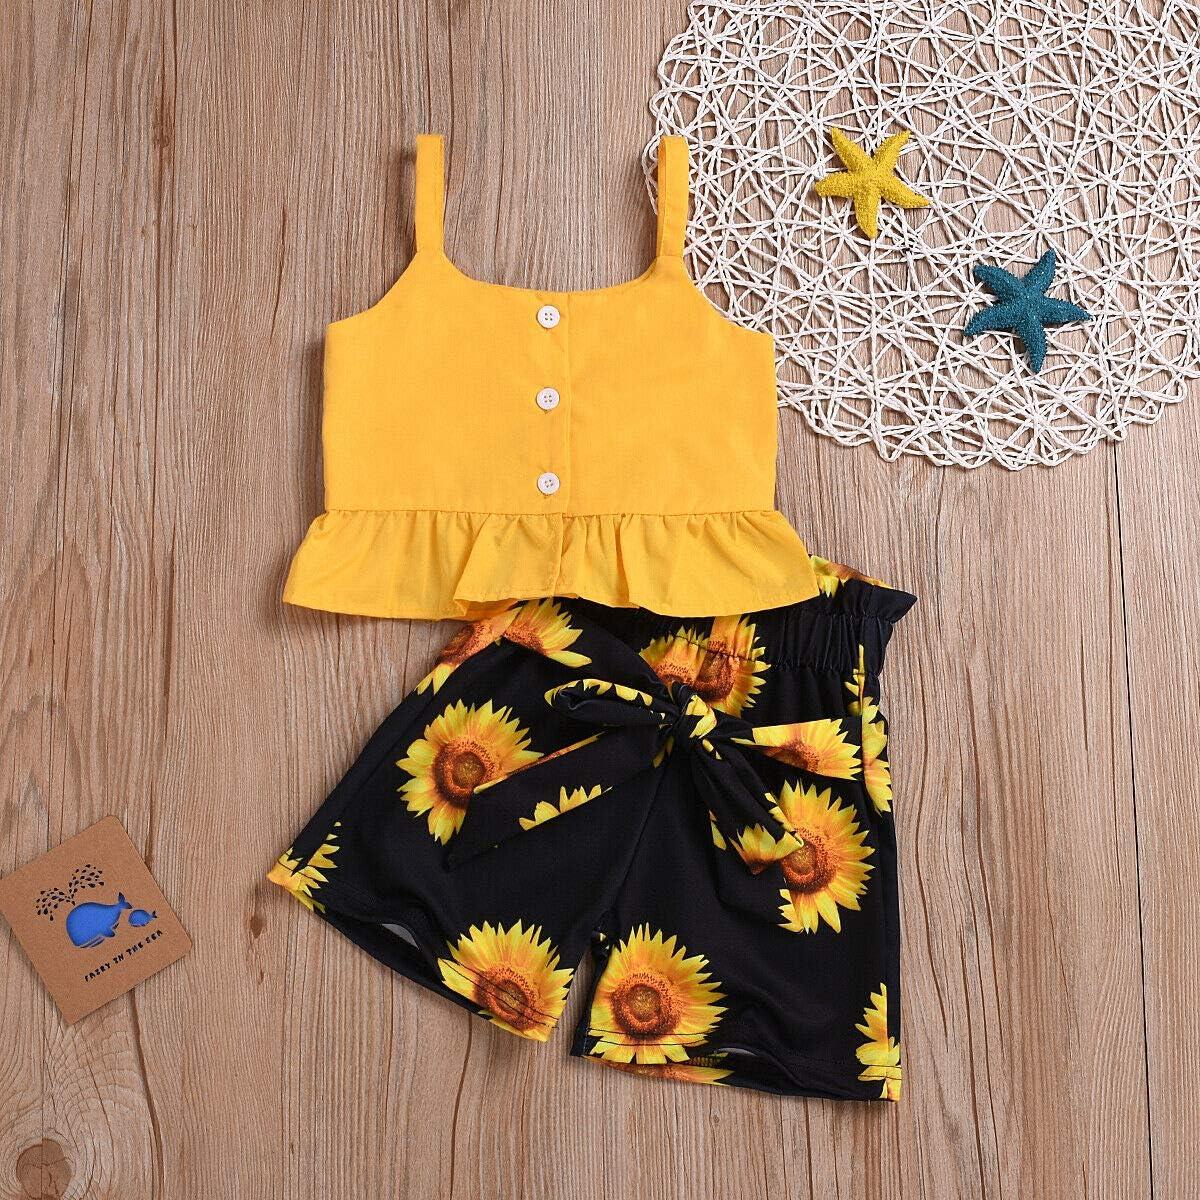 2PCS Toddler Baby Girl Summer Sleeveless Tank Tops Floral Waist Bowknot Sunflower Clothes